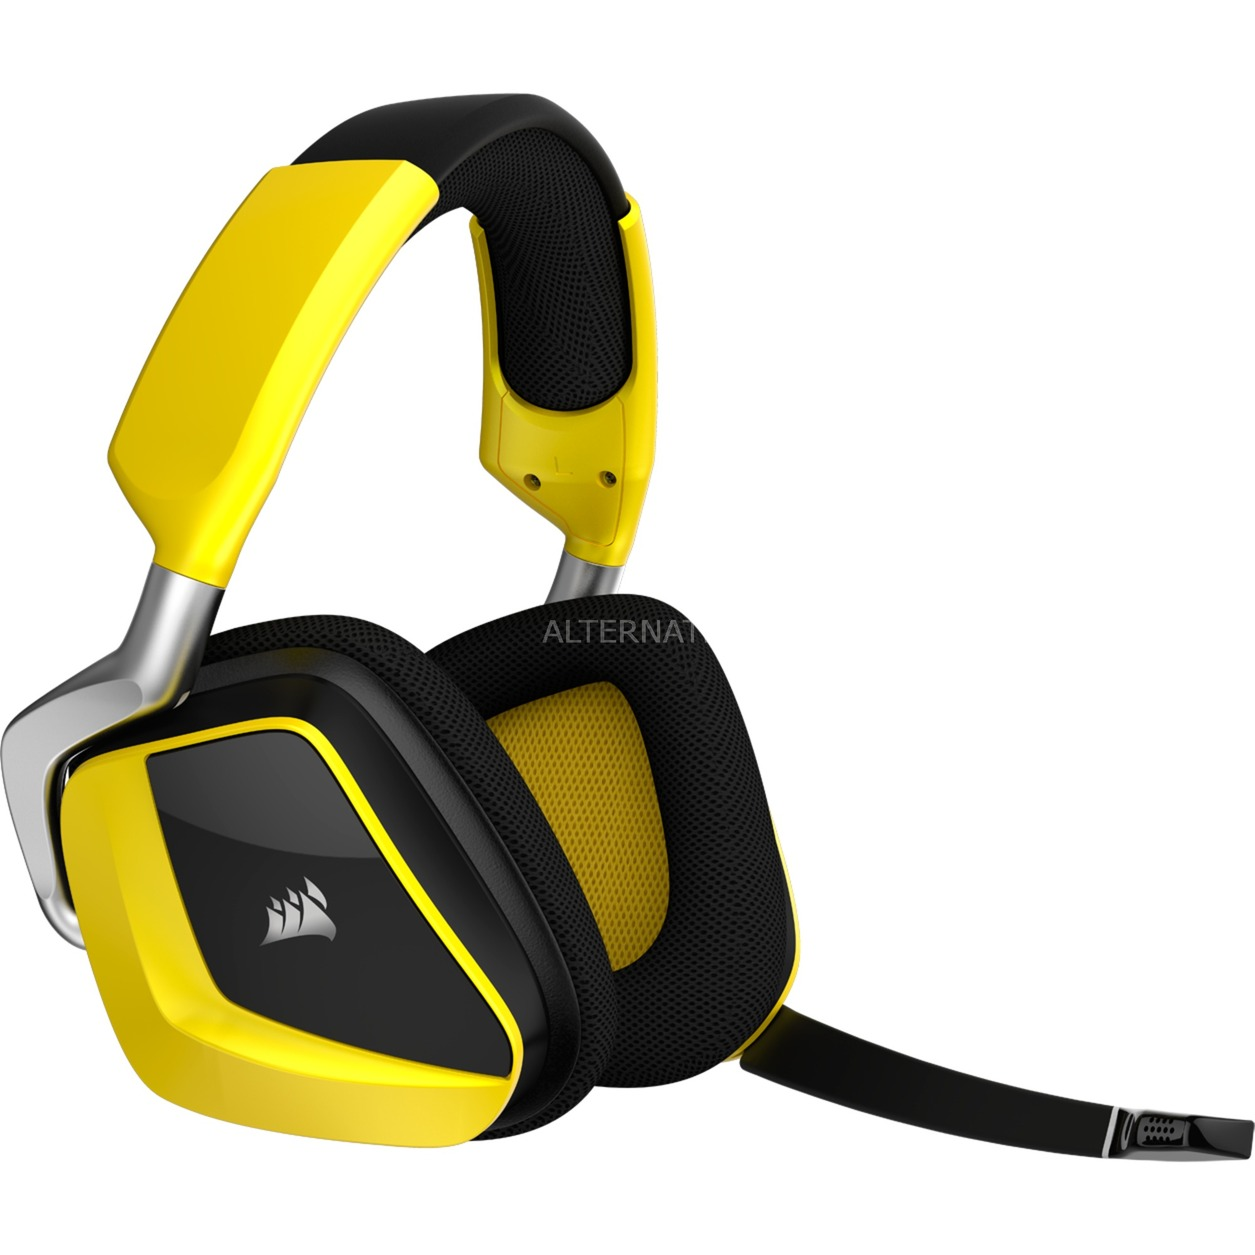 VOID PRO RGB Wireless SE Premium Binaurale Diadema Amarillo auricular con micrófono,...